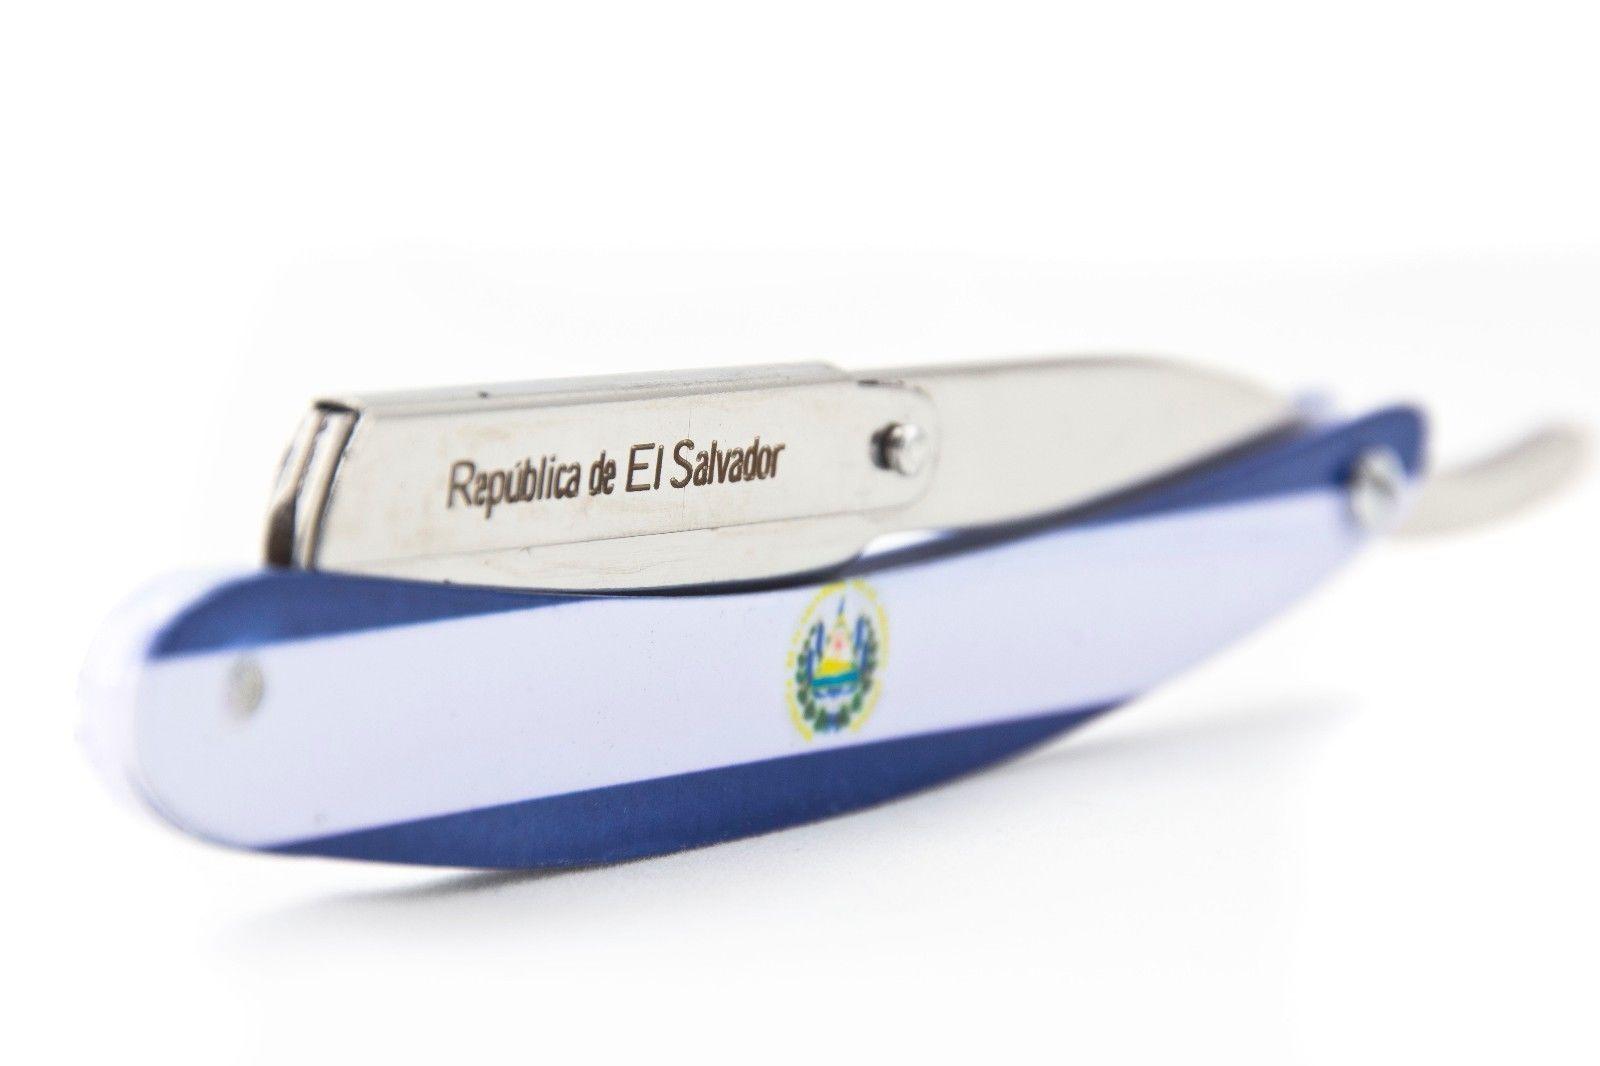 MD Barber El Salvador Flag Stainless Steel Razor Image Infused Handle